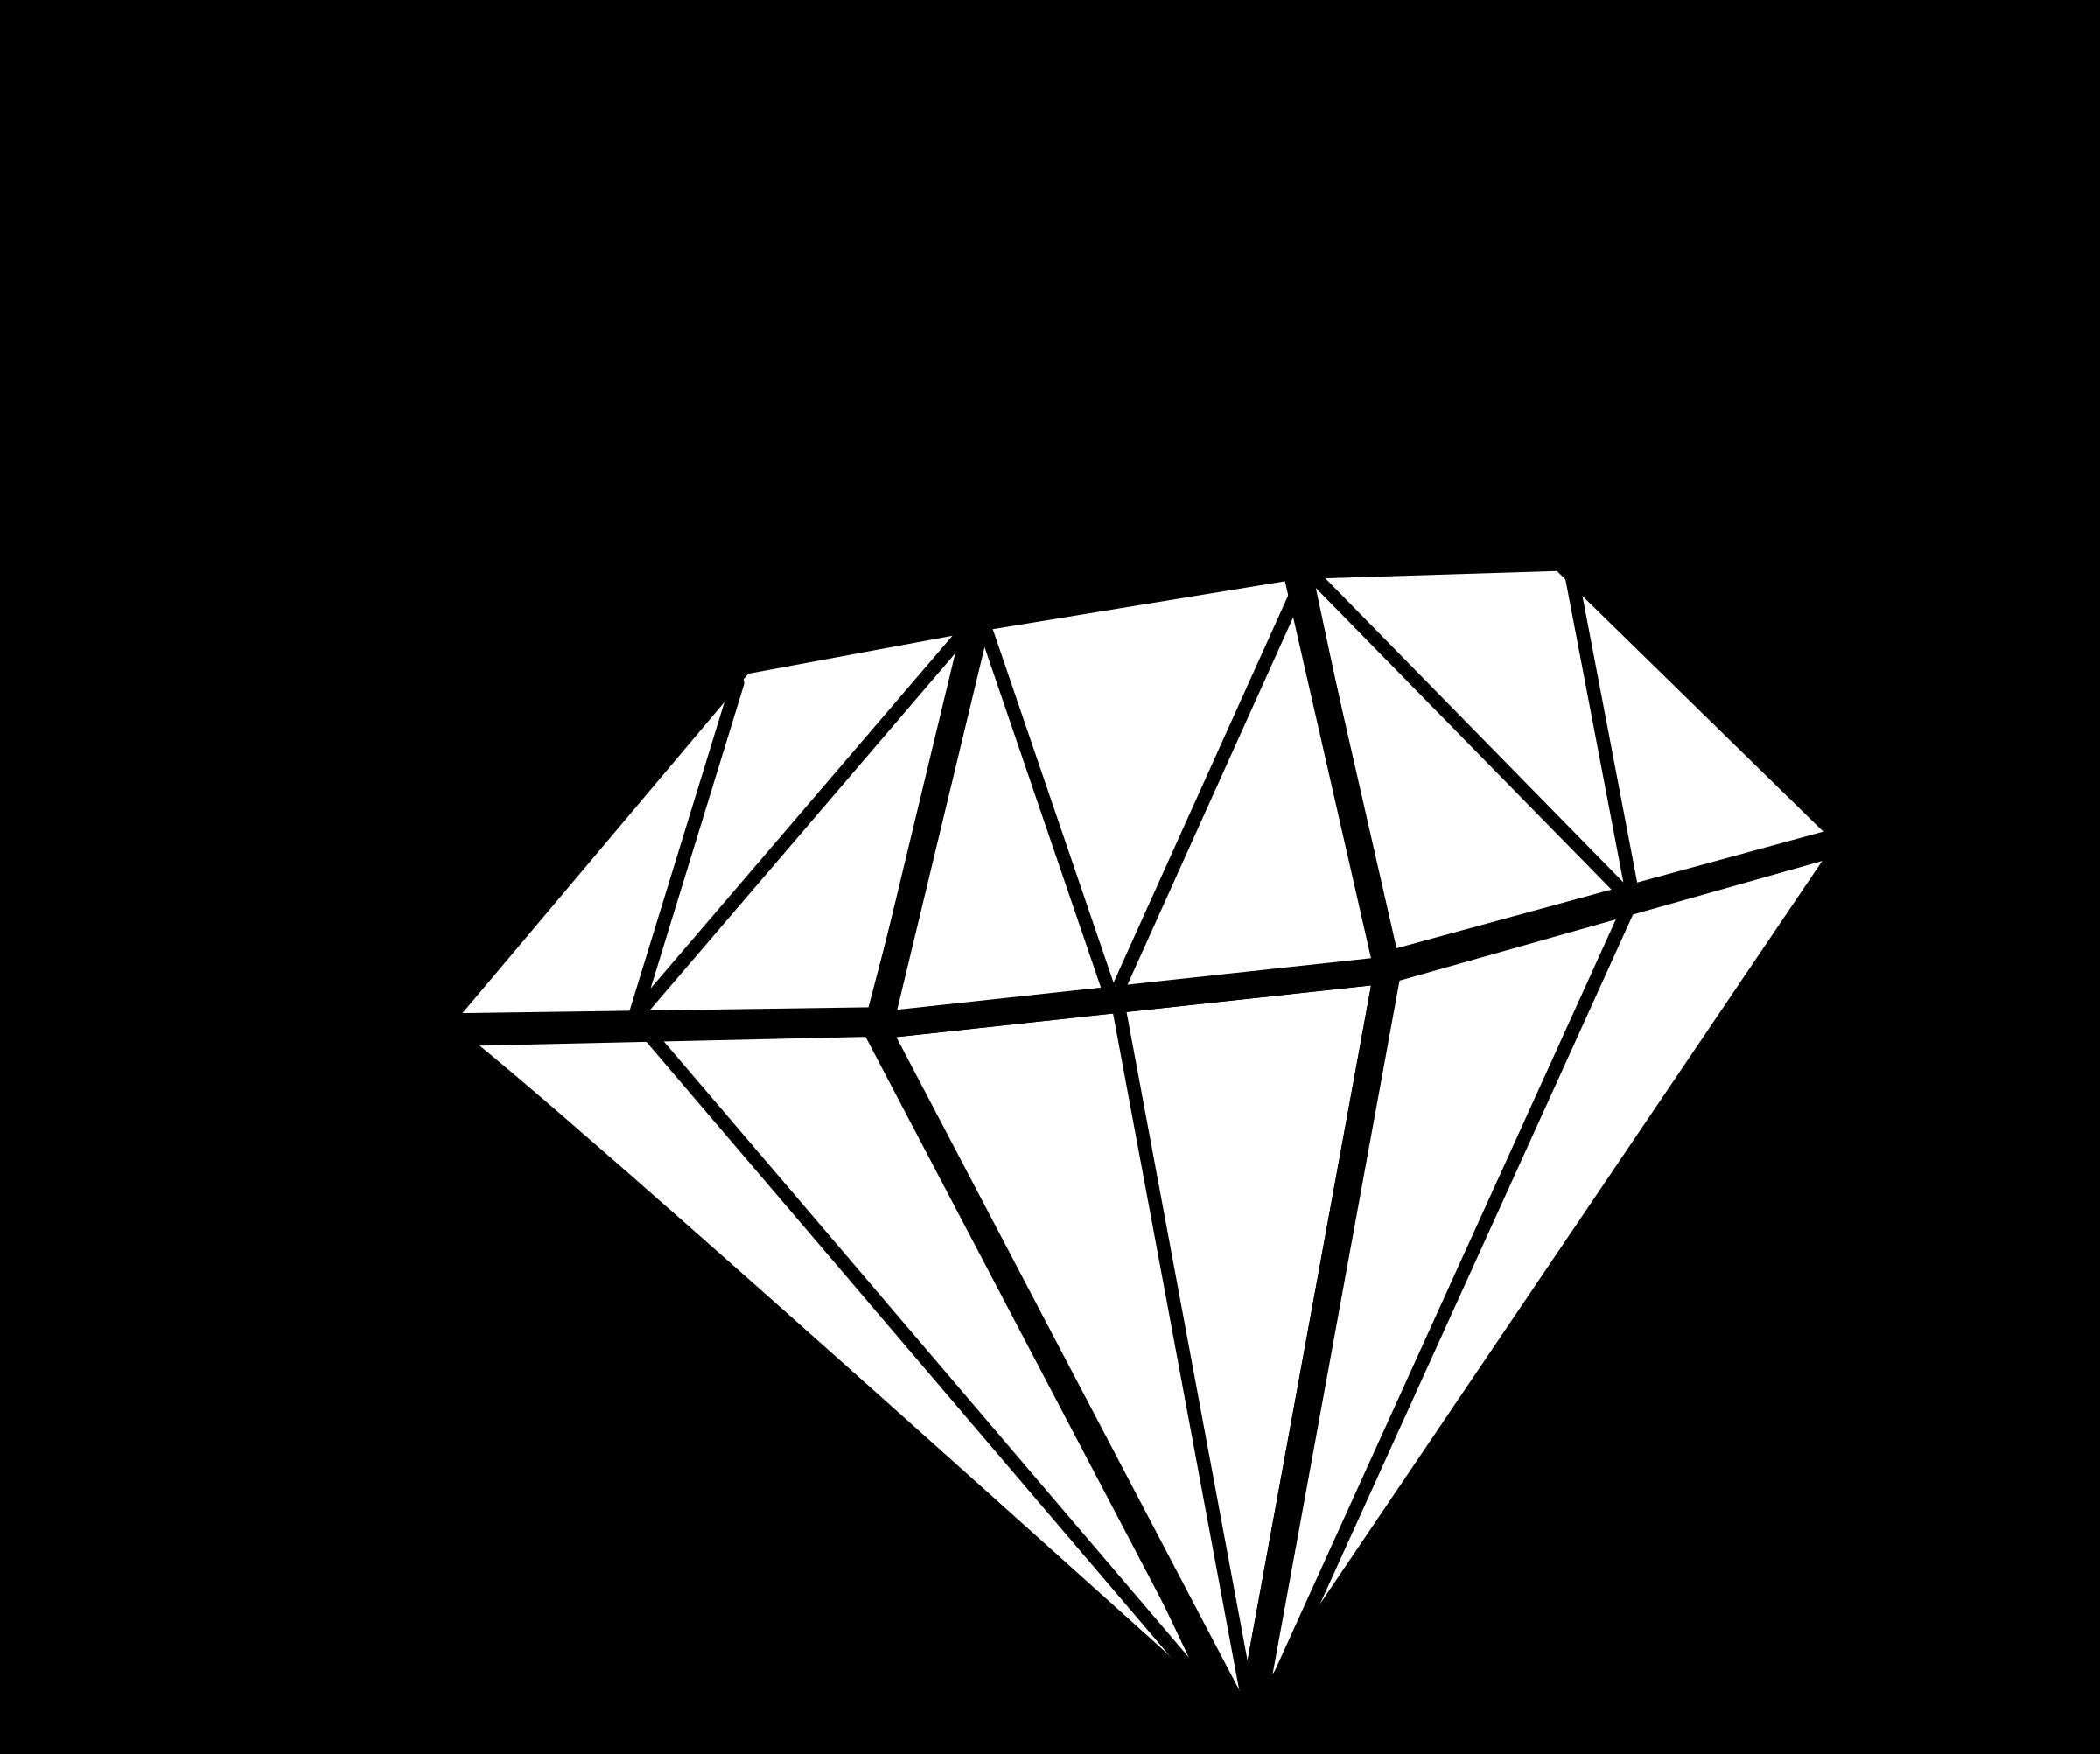 Diamant Diamond By Lmproulx Diamond Vector Diamond Fashion Art Images